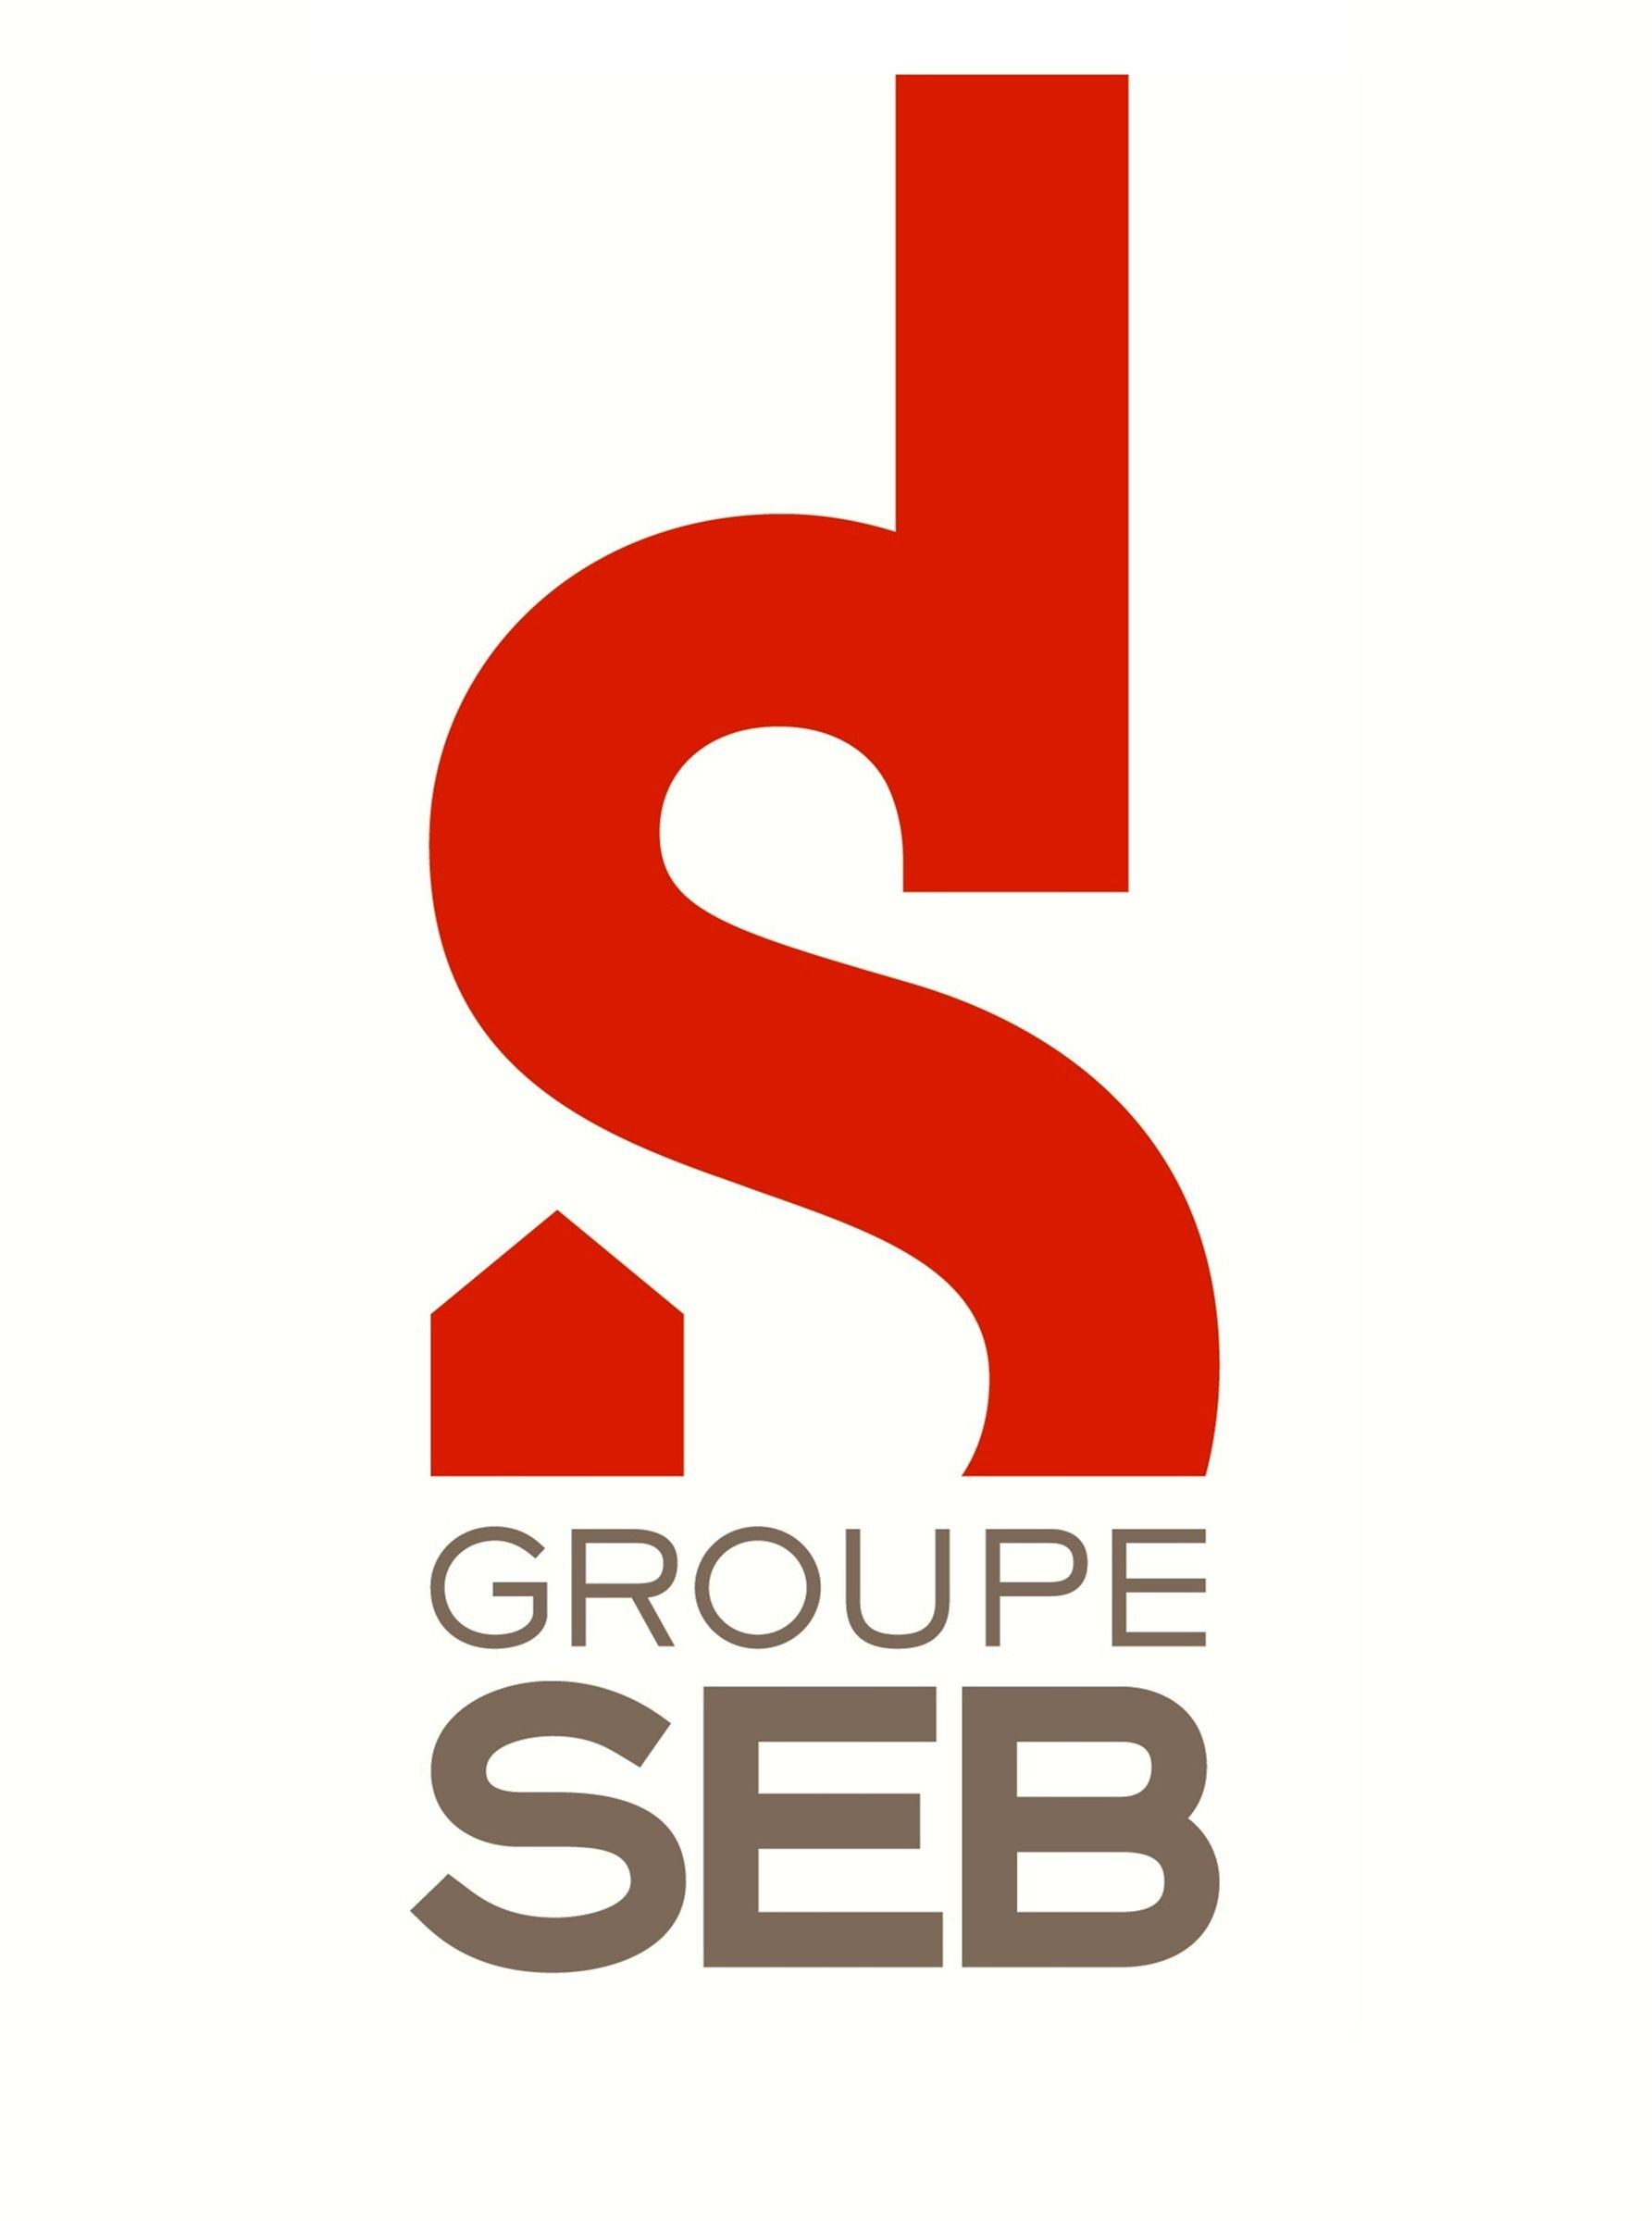 groupe seb logo Tech company logos, Name logo, Vimeo logo